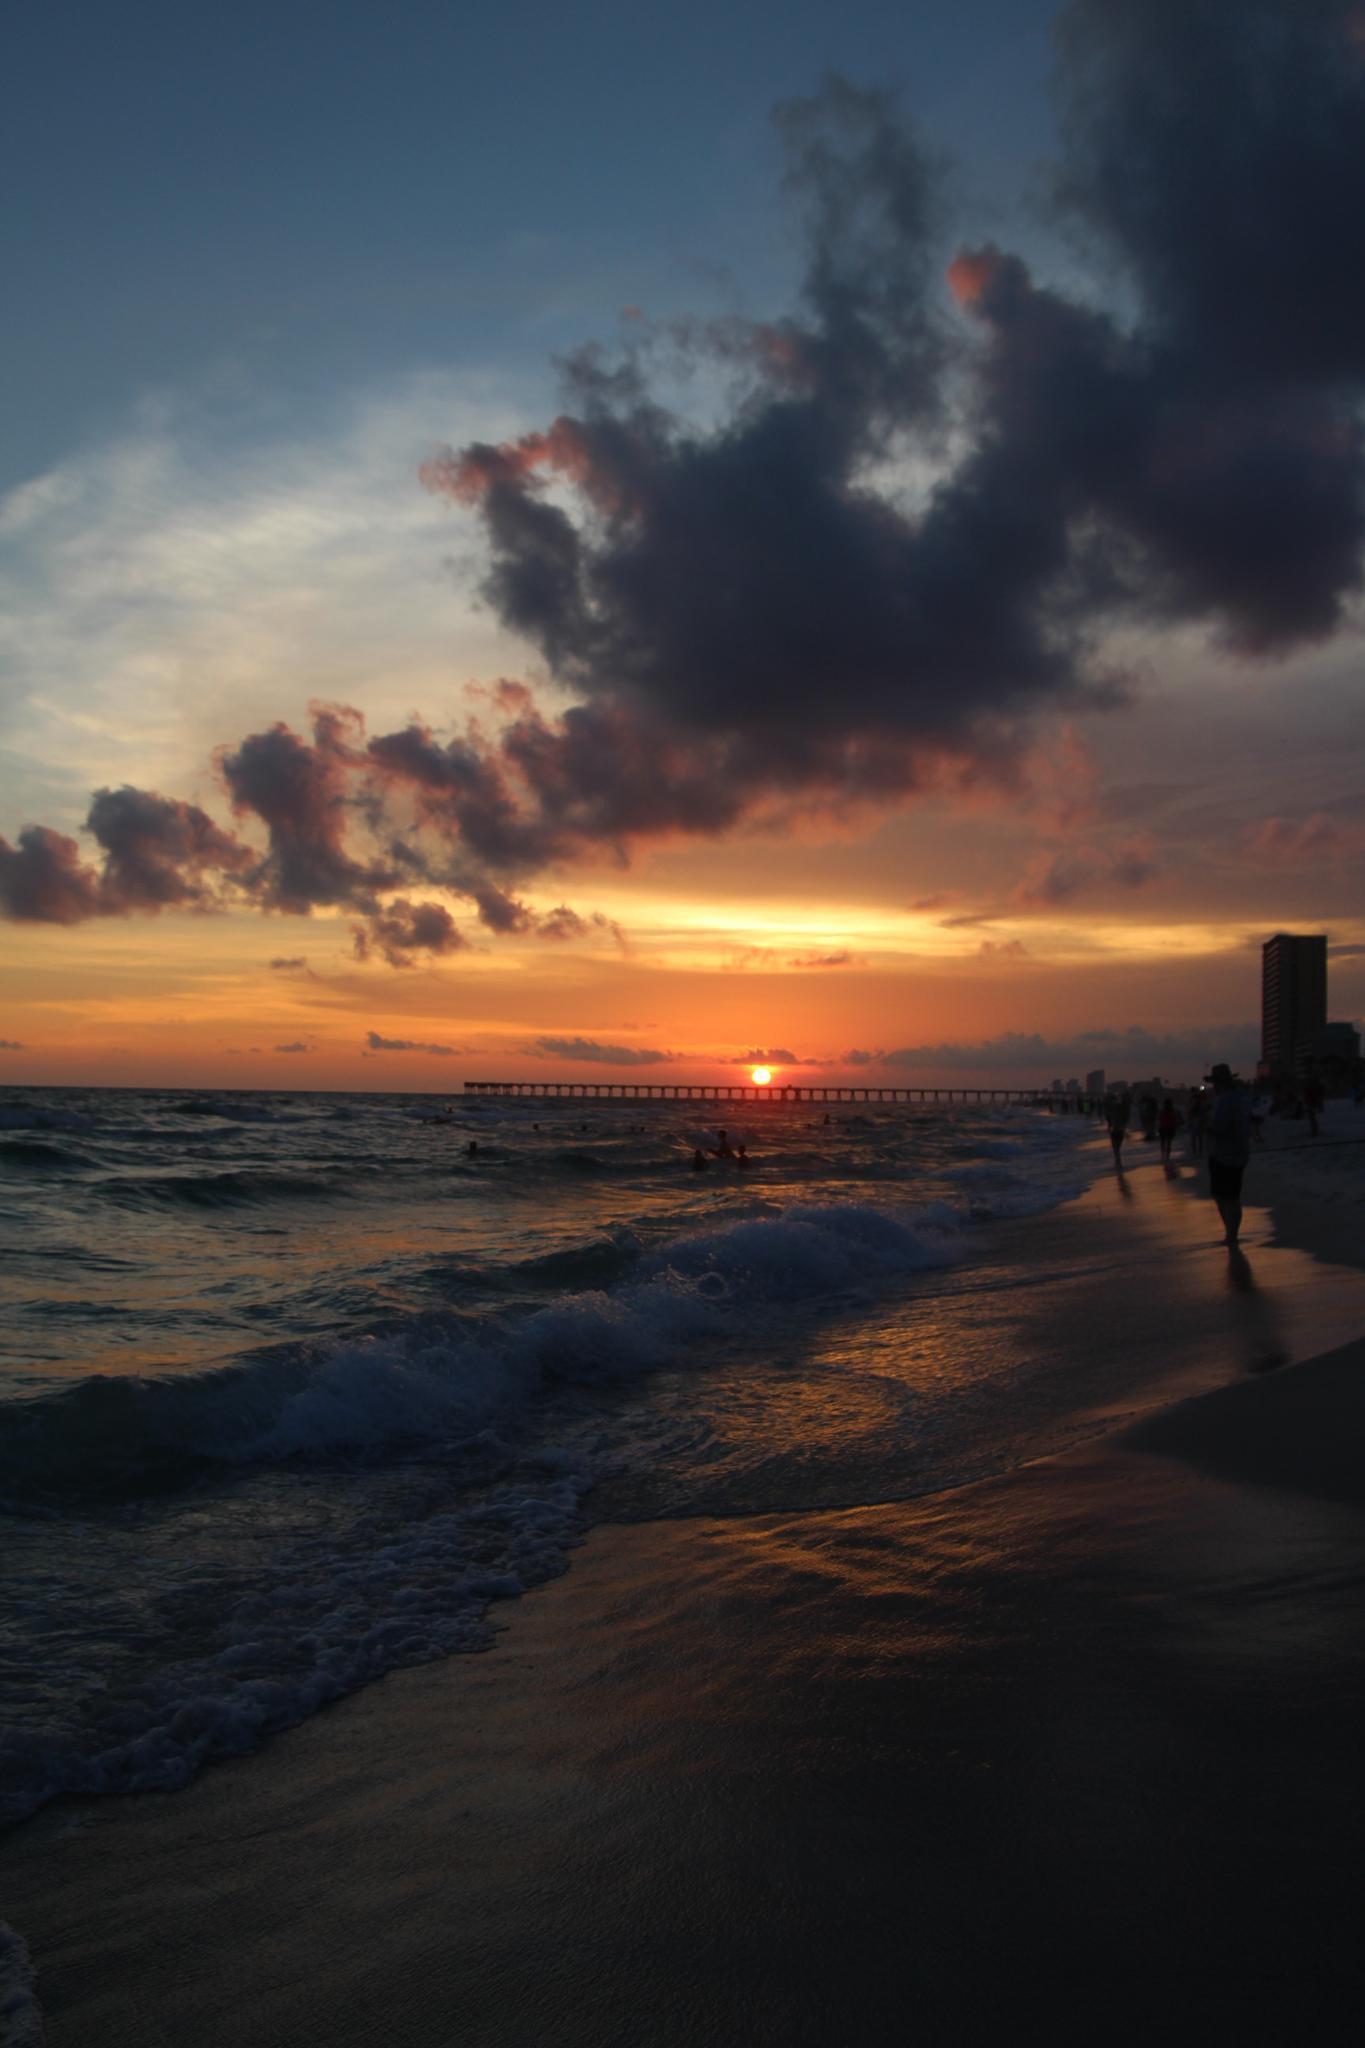 Panam city beach - sunset by NikolaSmidova